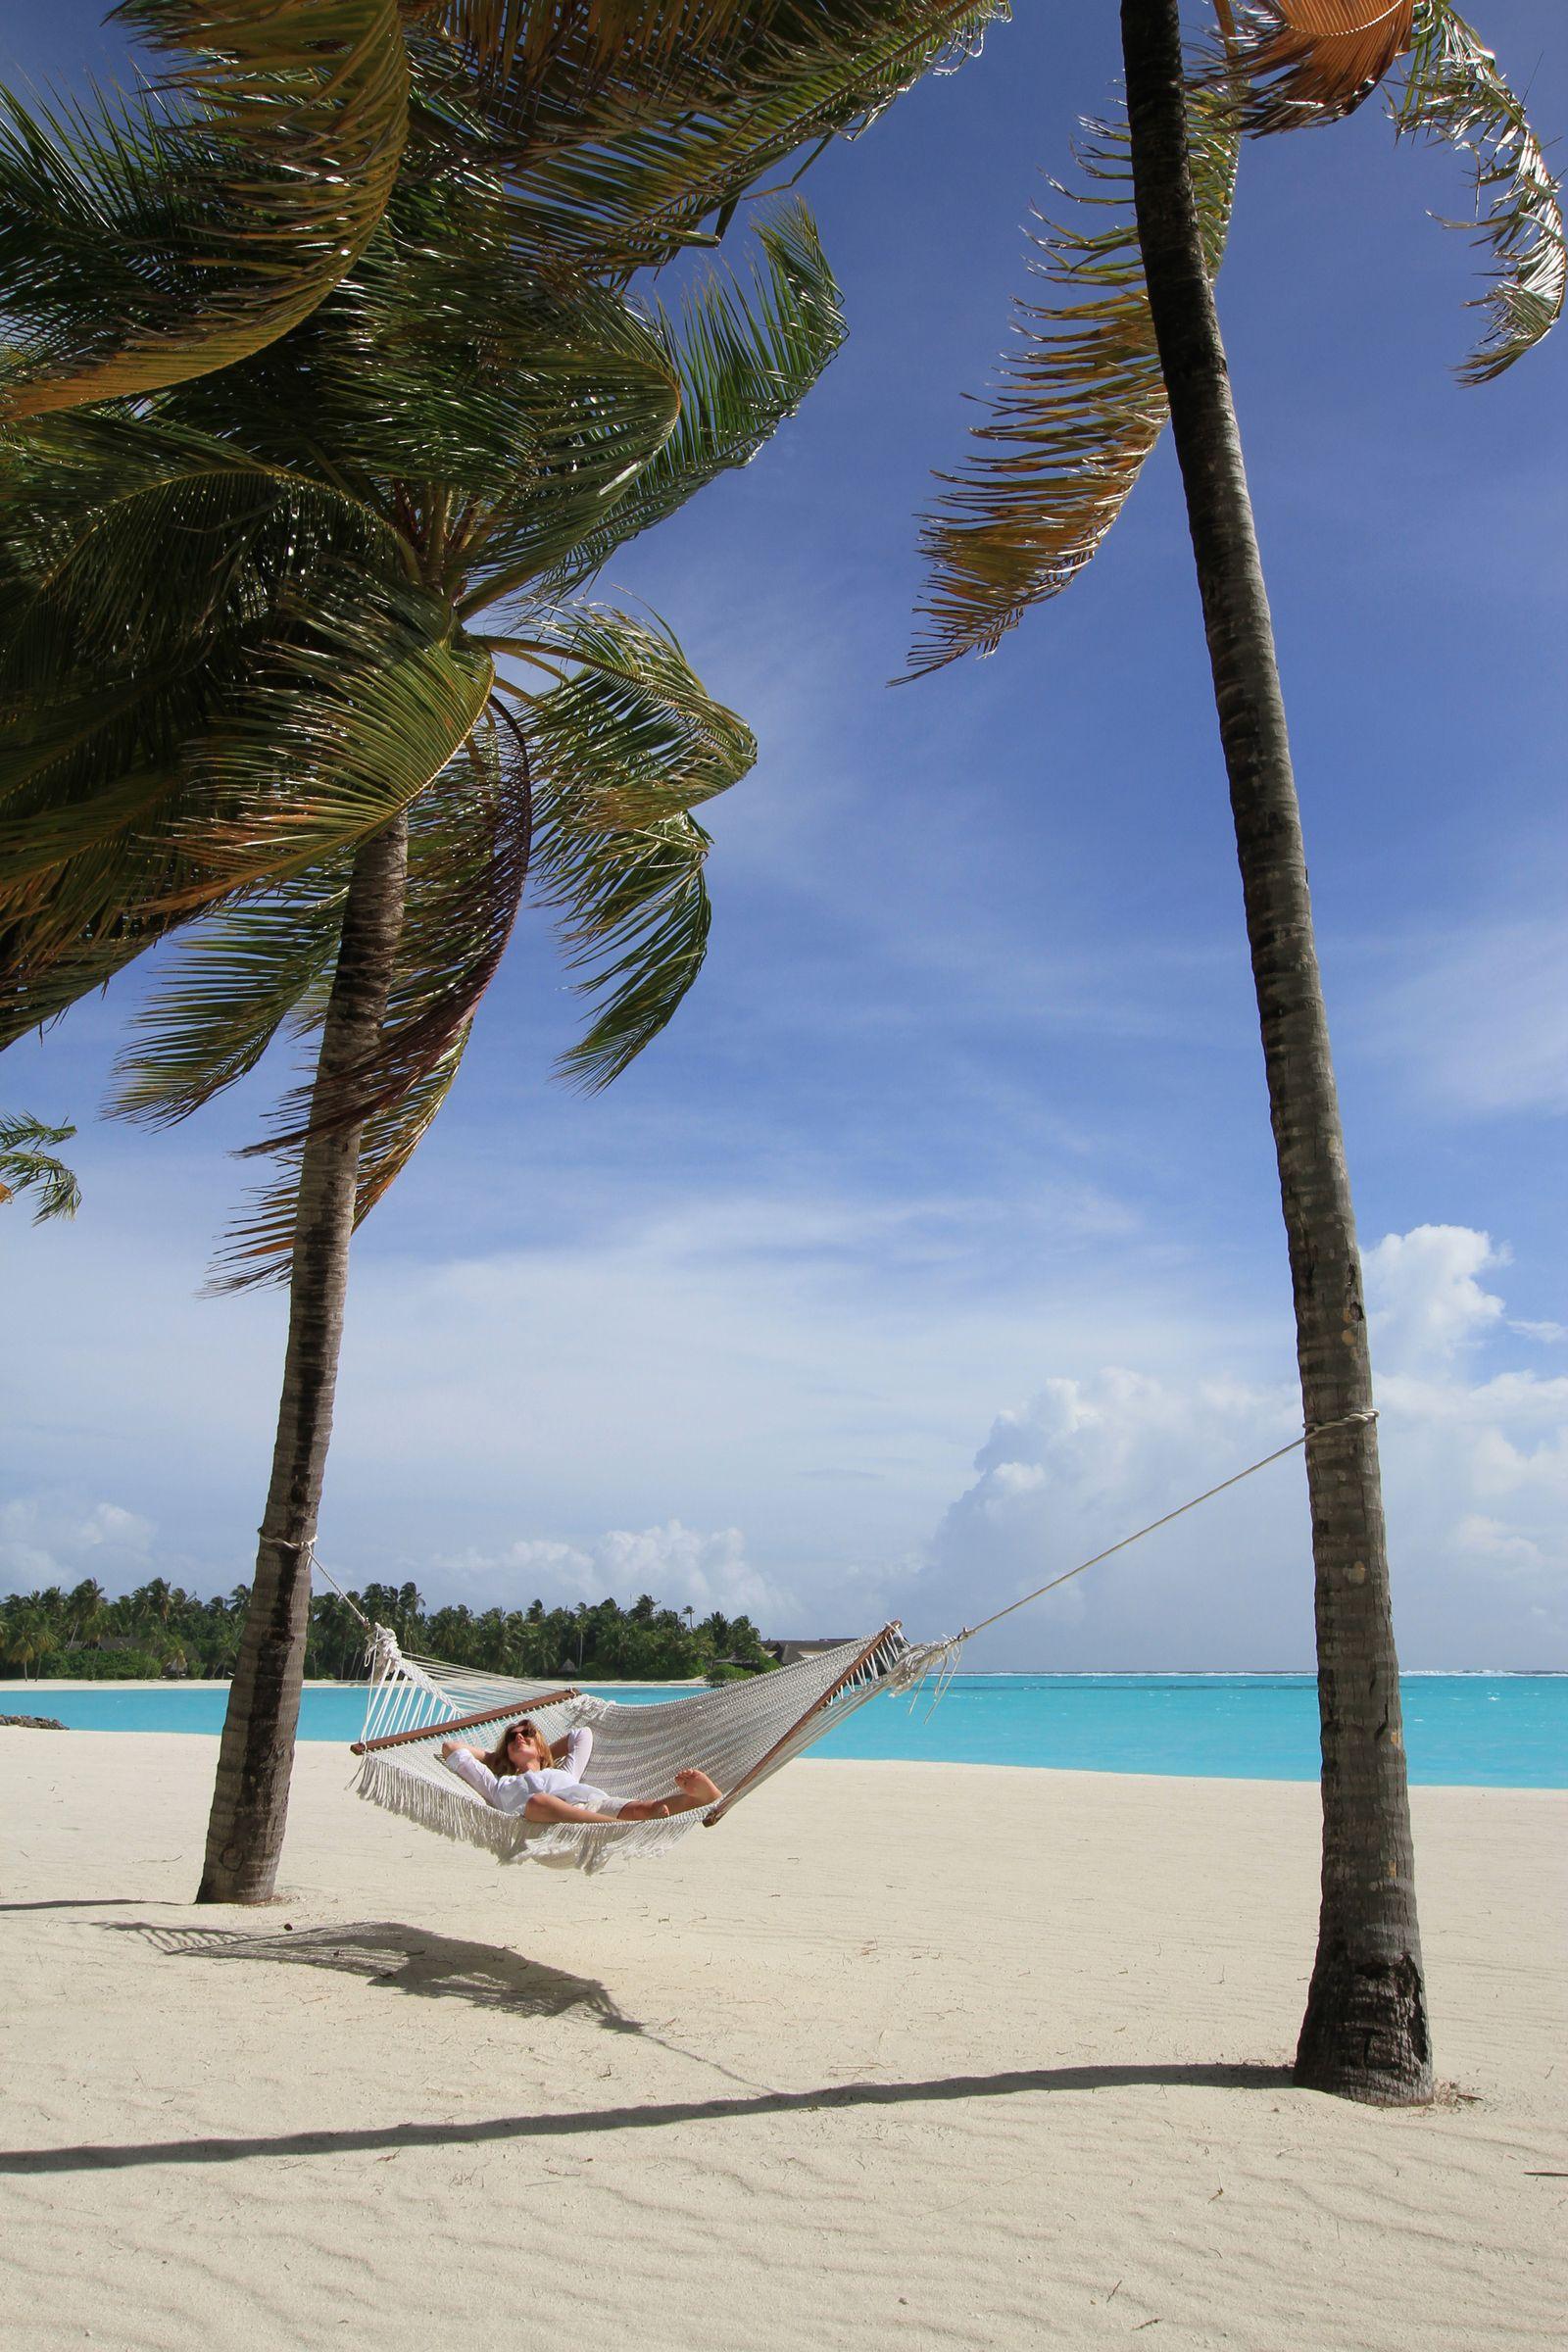 EINMALIGE VERWENDUNG Robinson-Crusoe-Feeling / Malediven / TMN